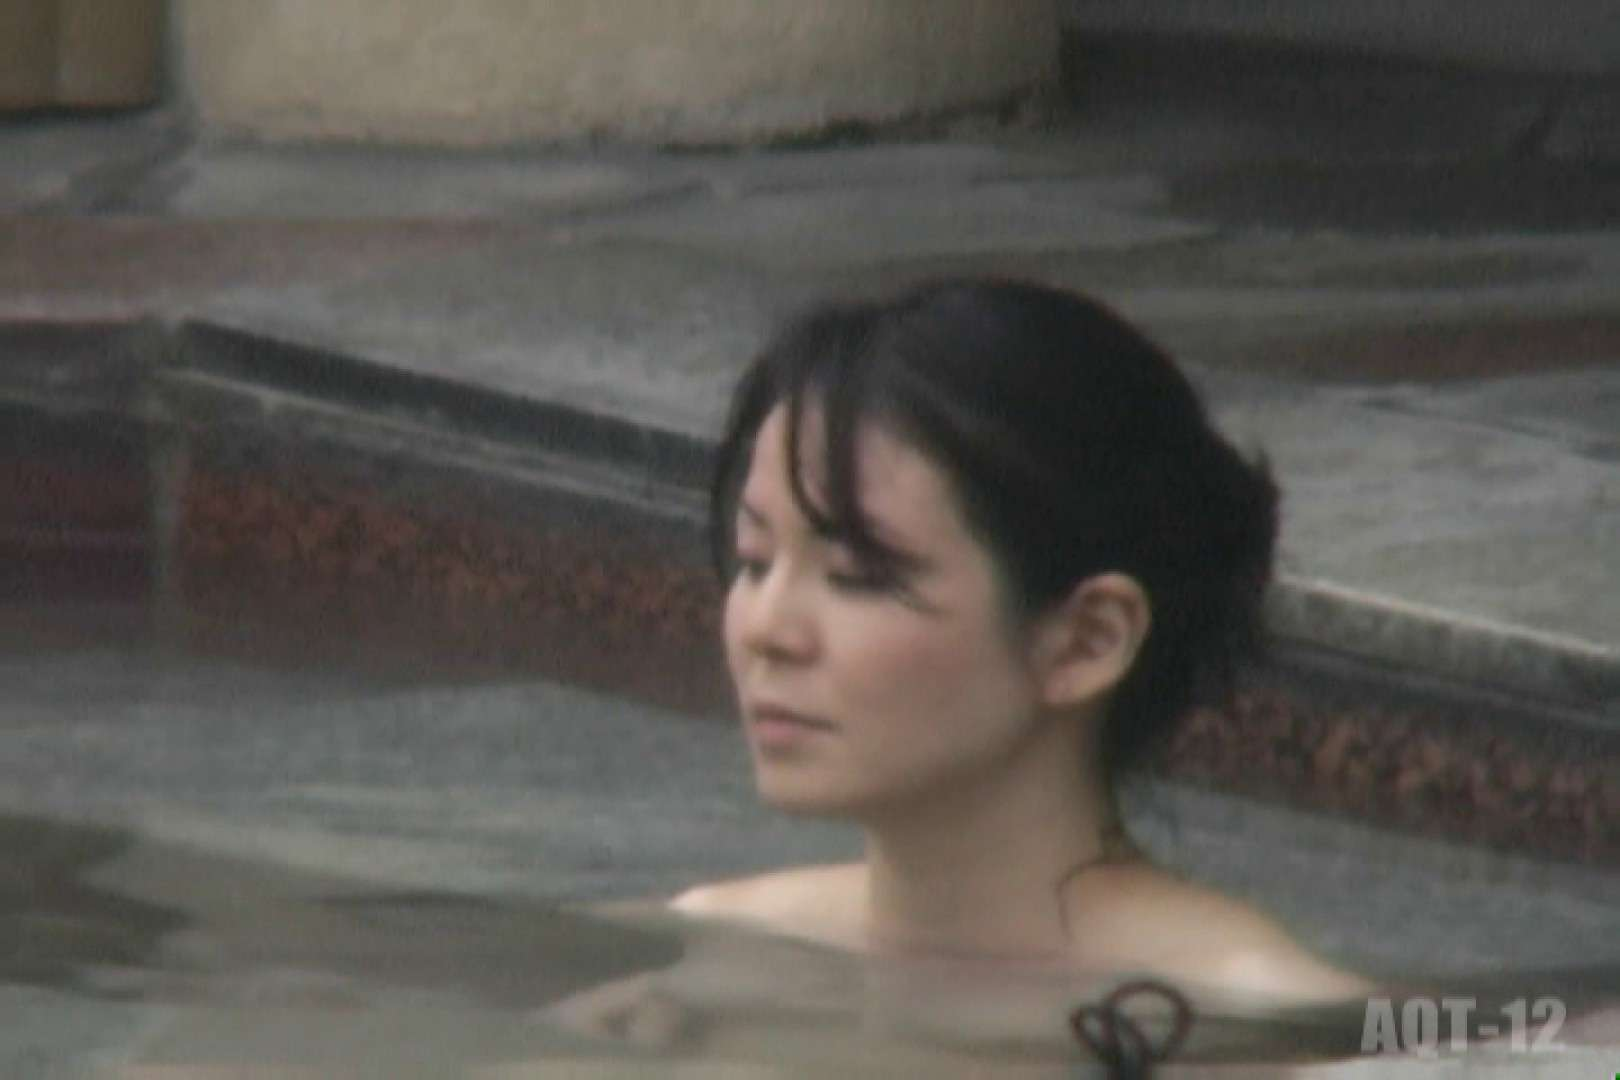 Aquaな露天風呂Vol.811 盗撮特撮 オメコ無修正動画無料 11pic 2